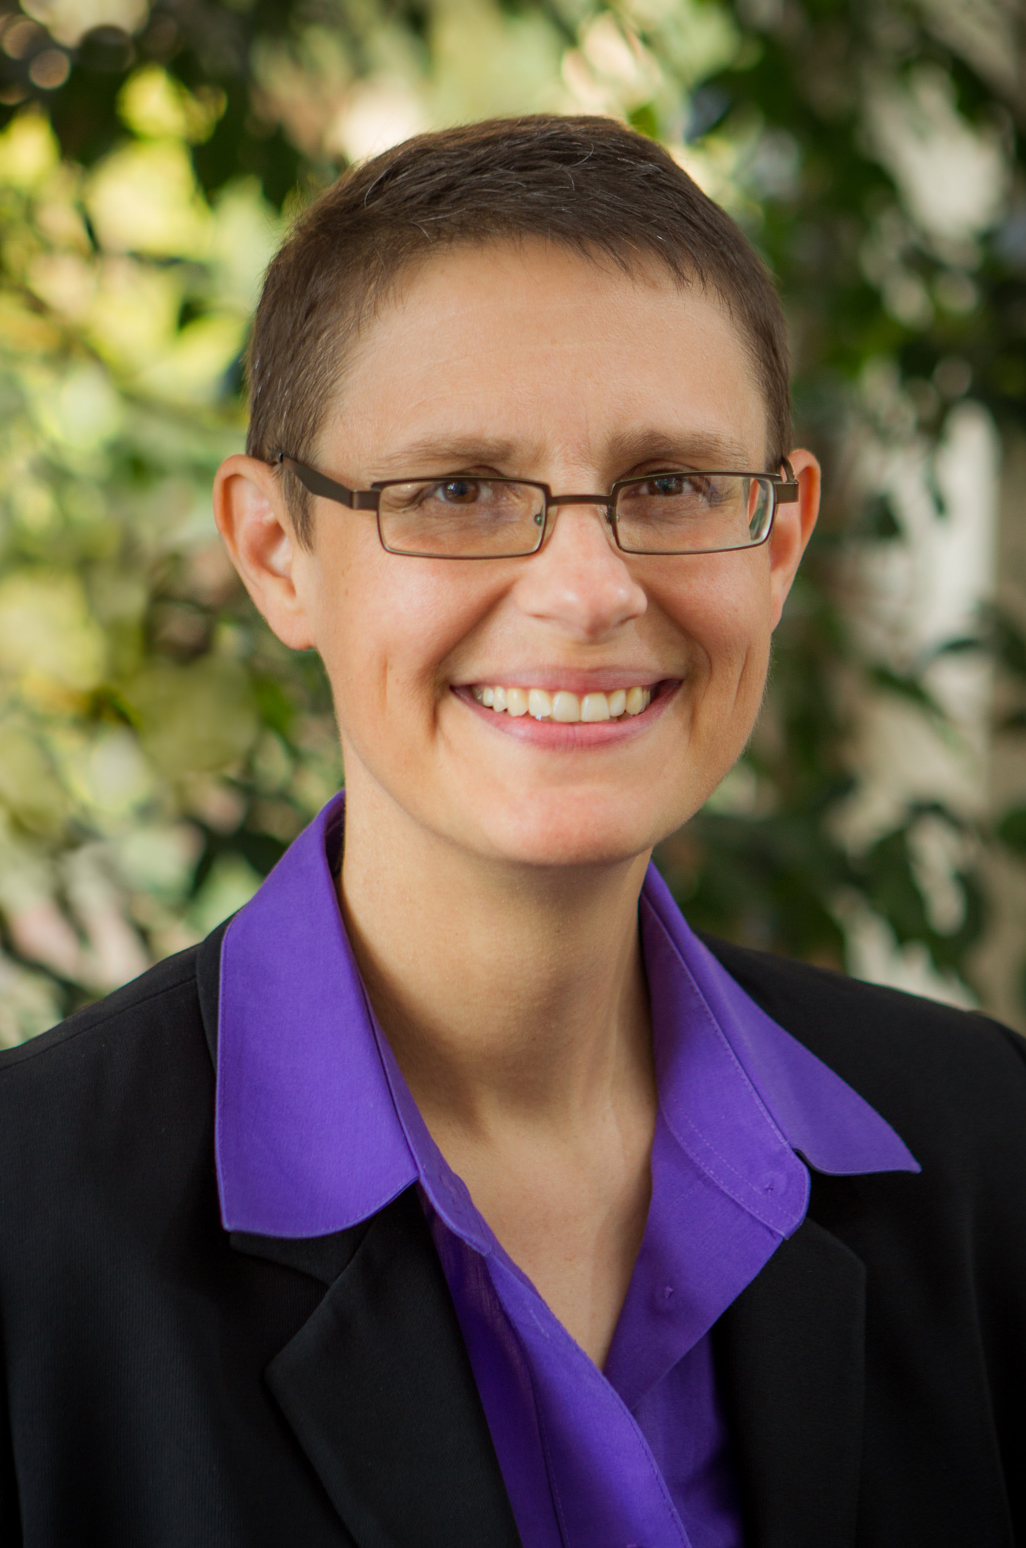 Kelly Barsdate